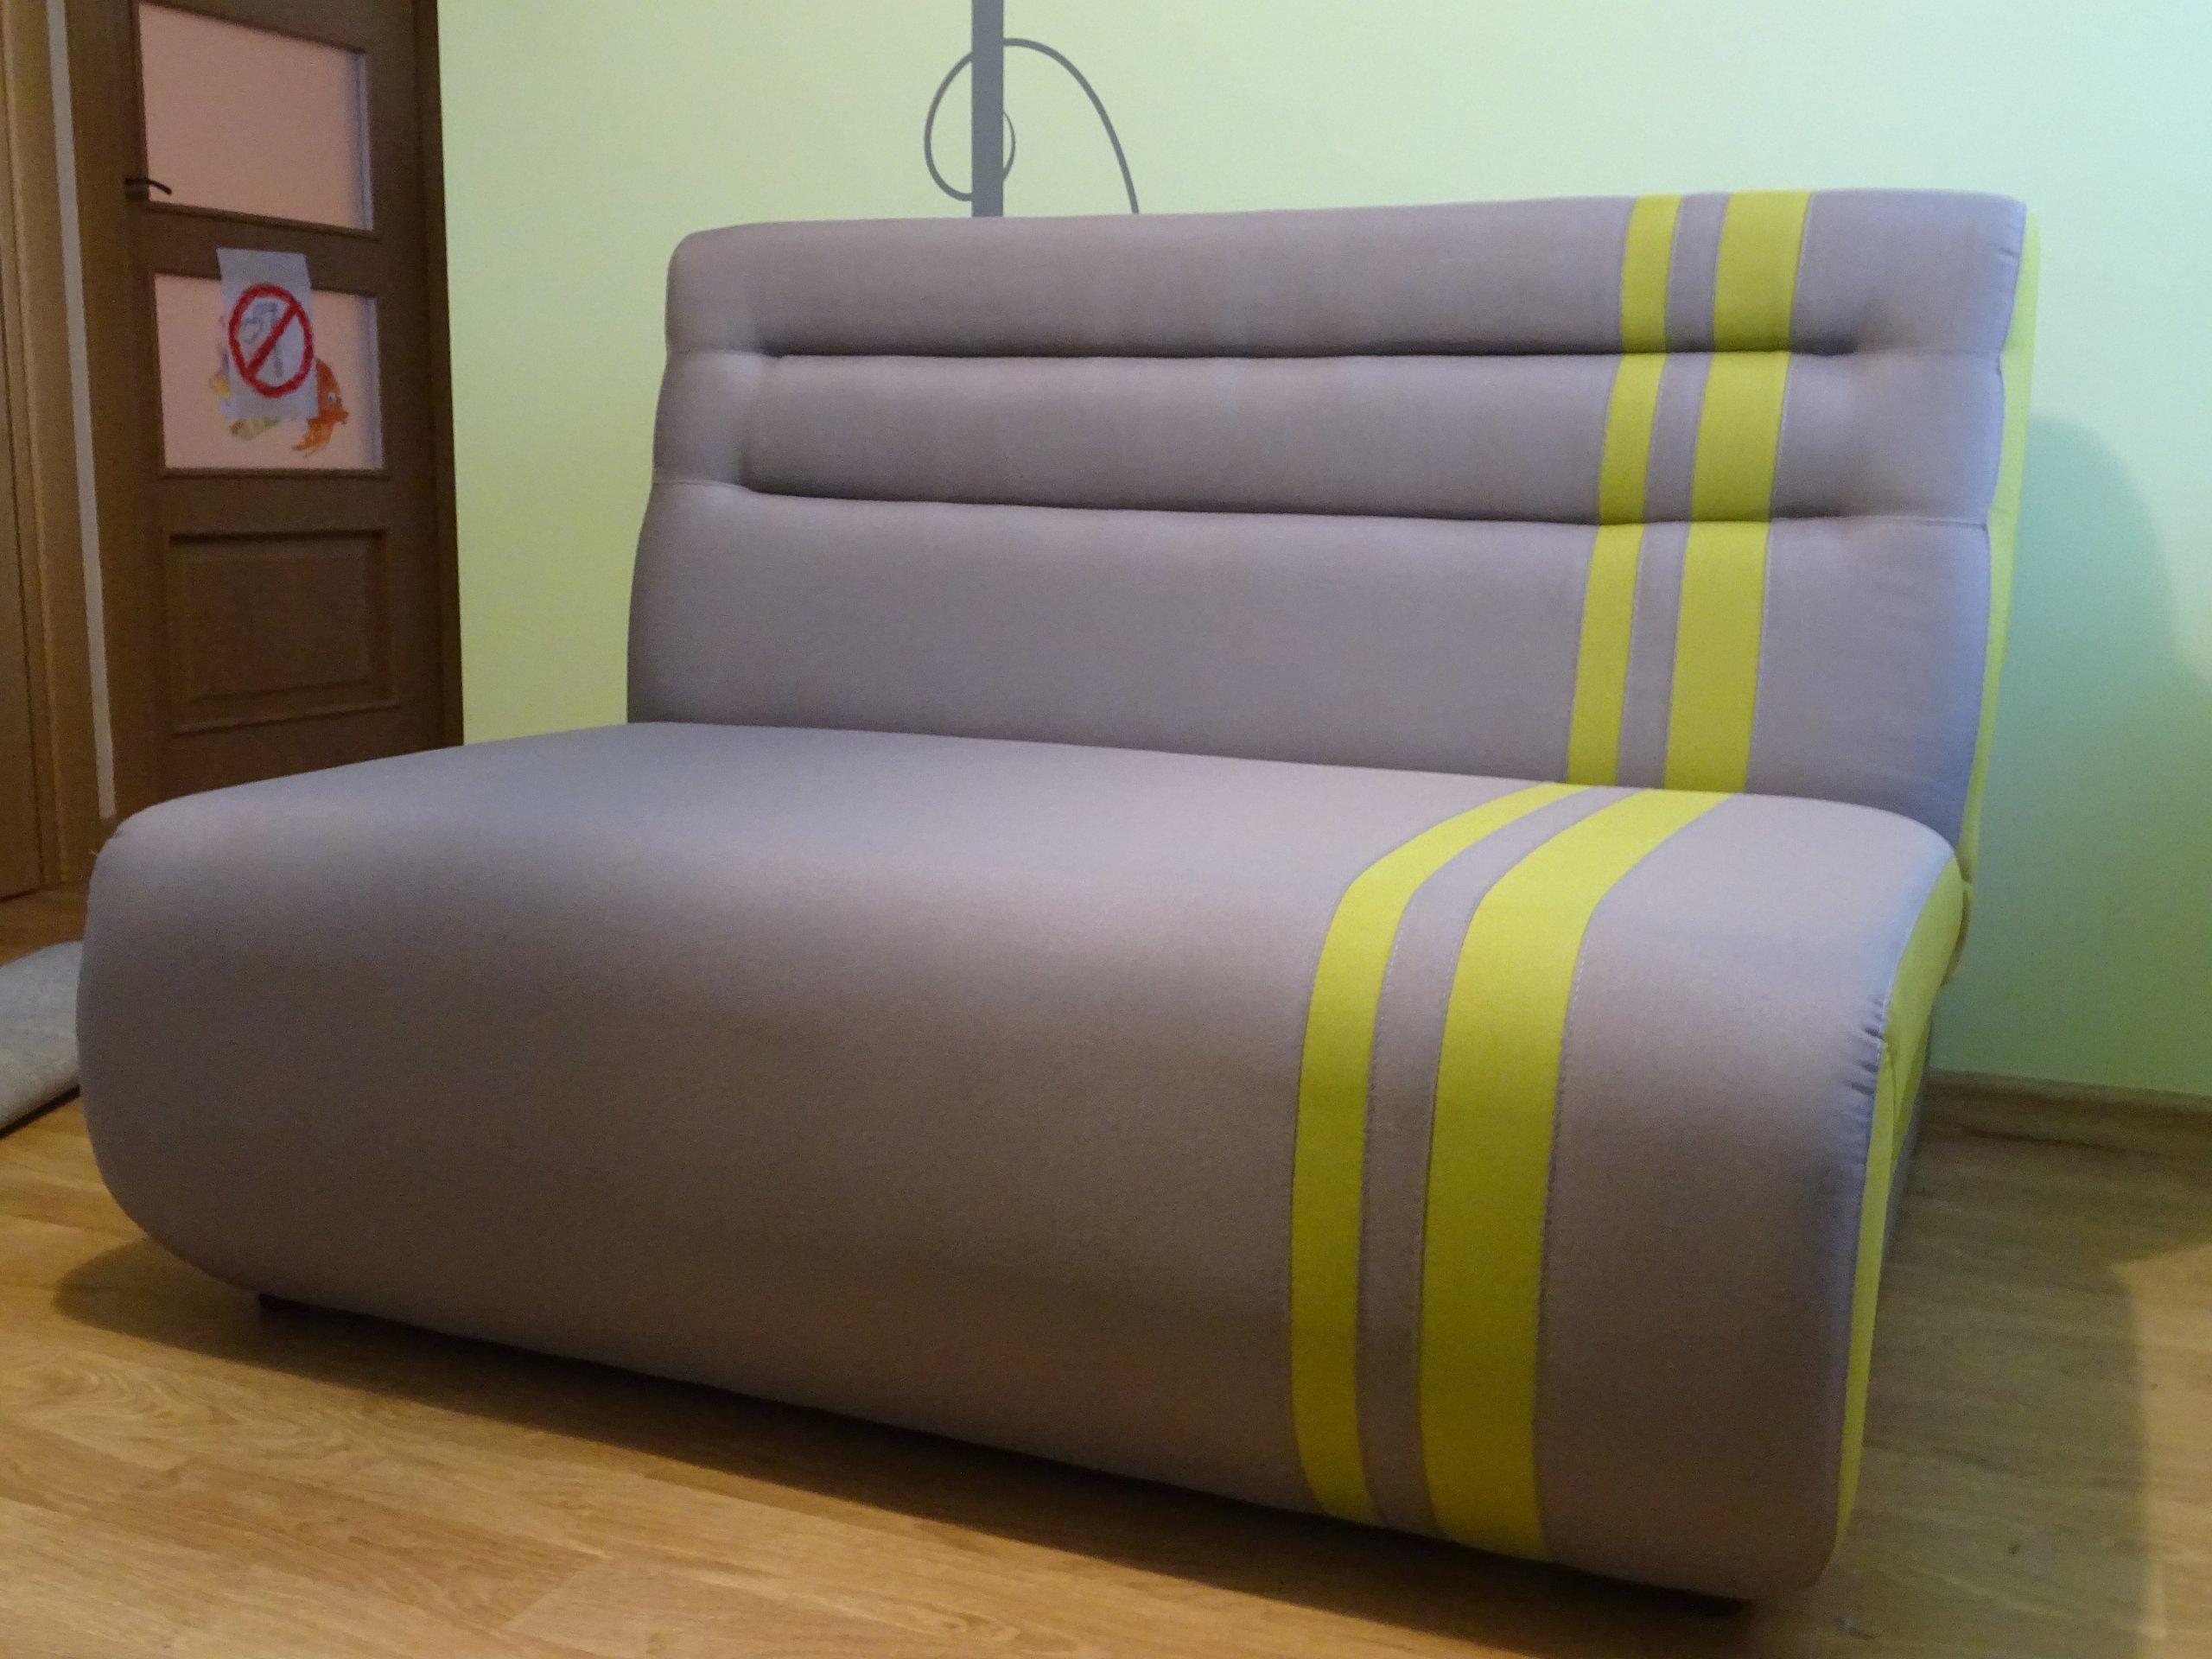 Sofa Olaf 2 Os Z Funkcją Spania Agata Meble 7122851930